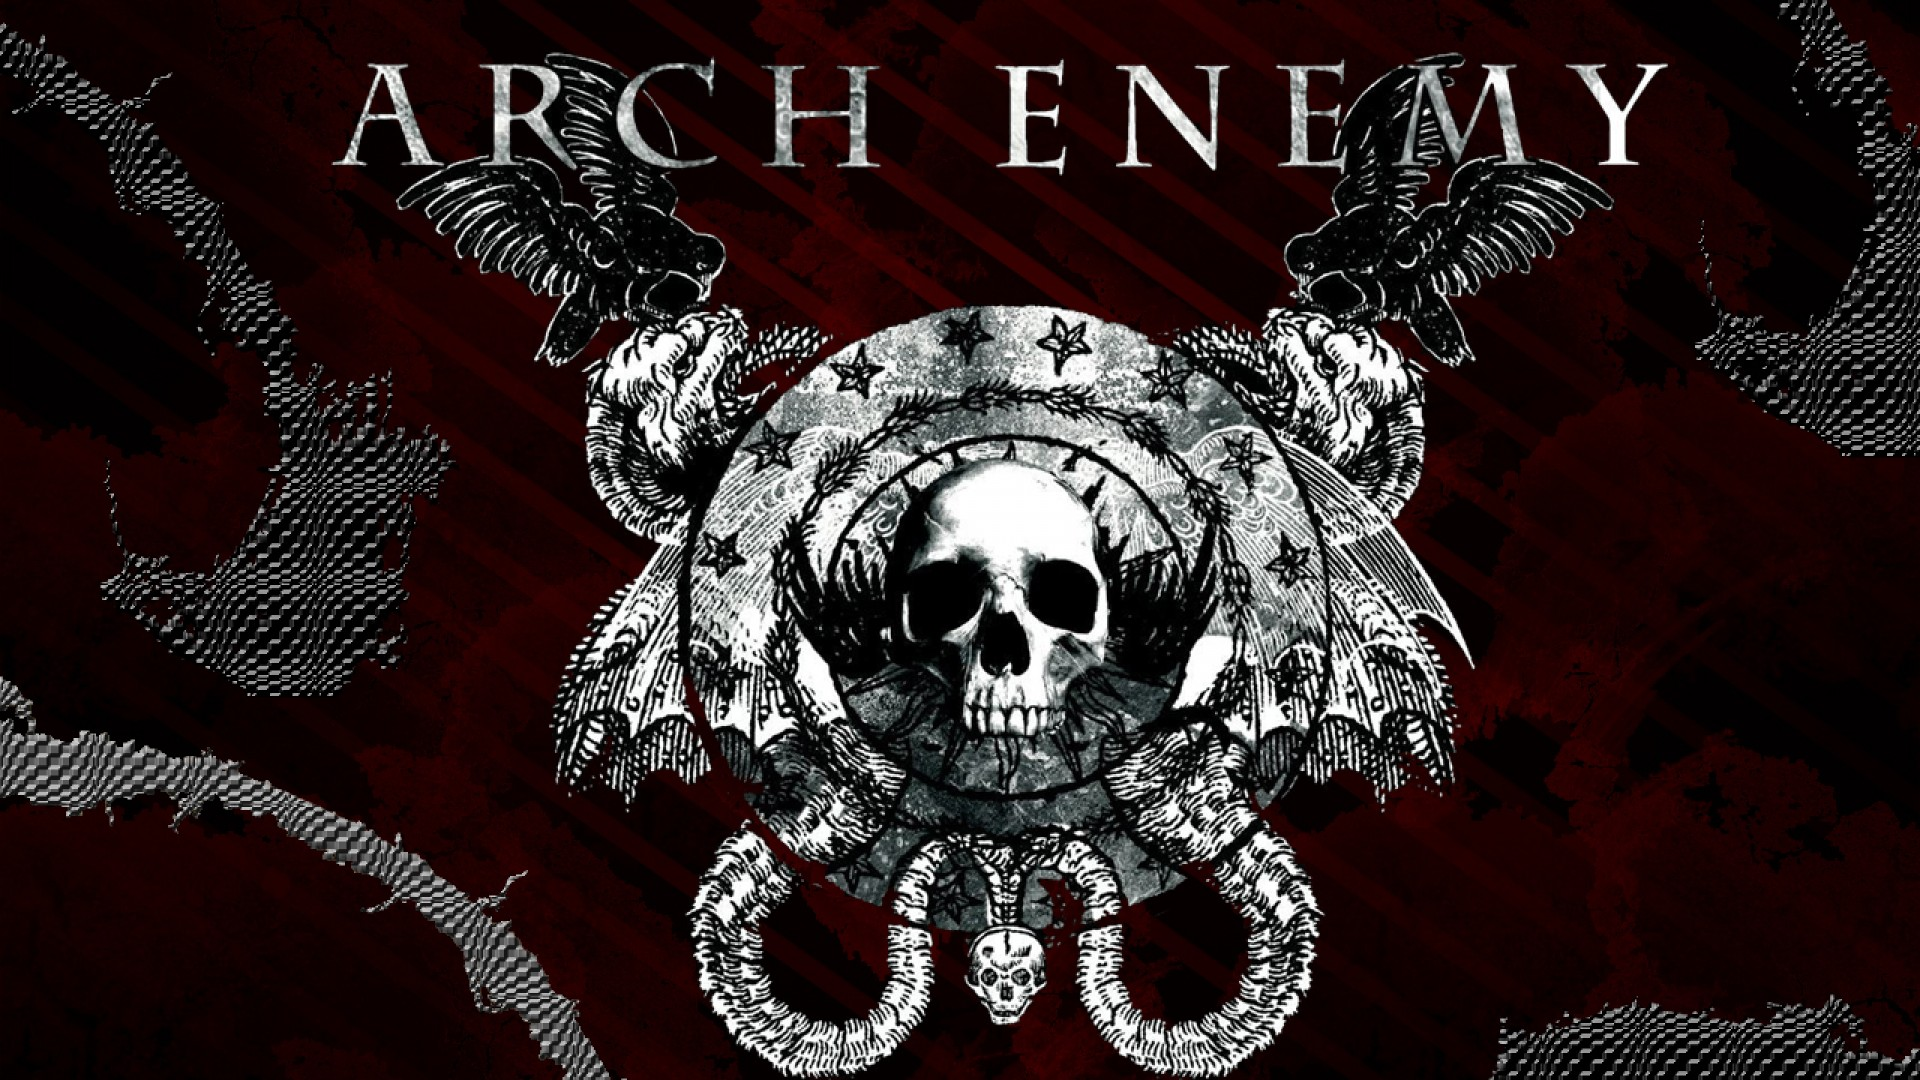 Arch enemy technical power death metal hard rock heavy o - Death metal wallpaper ...